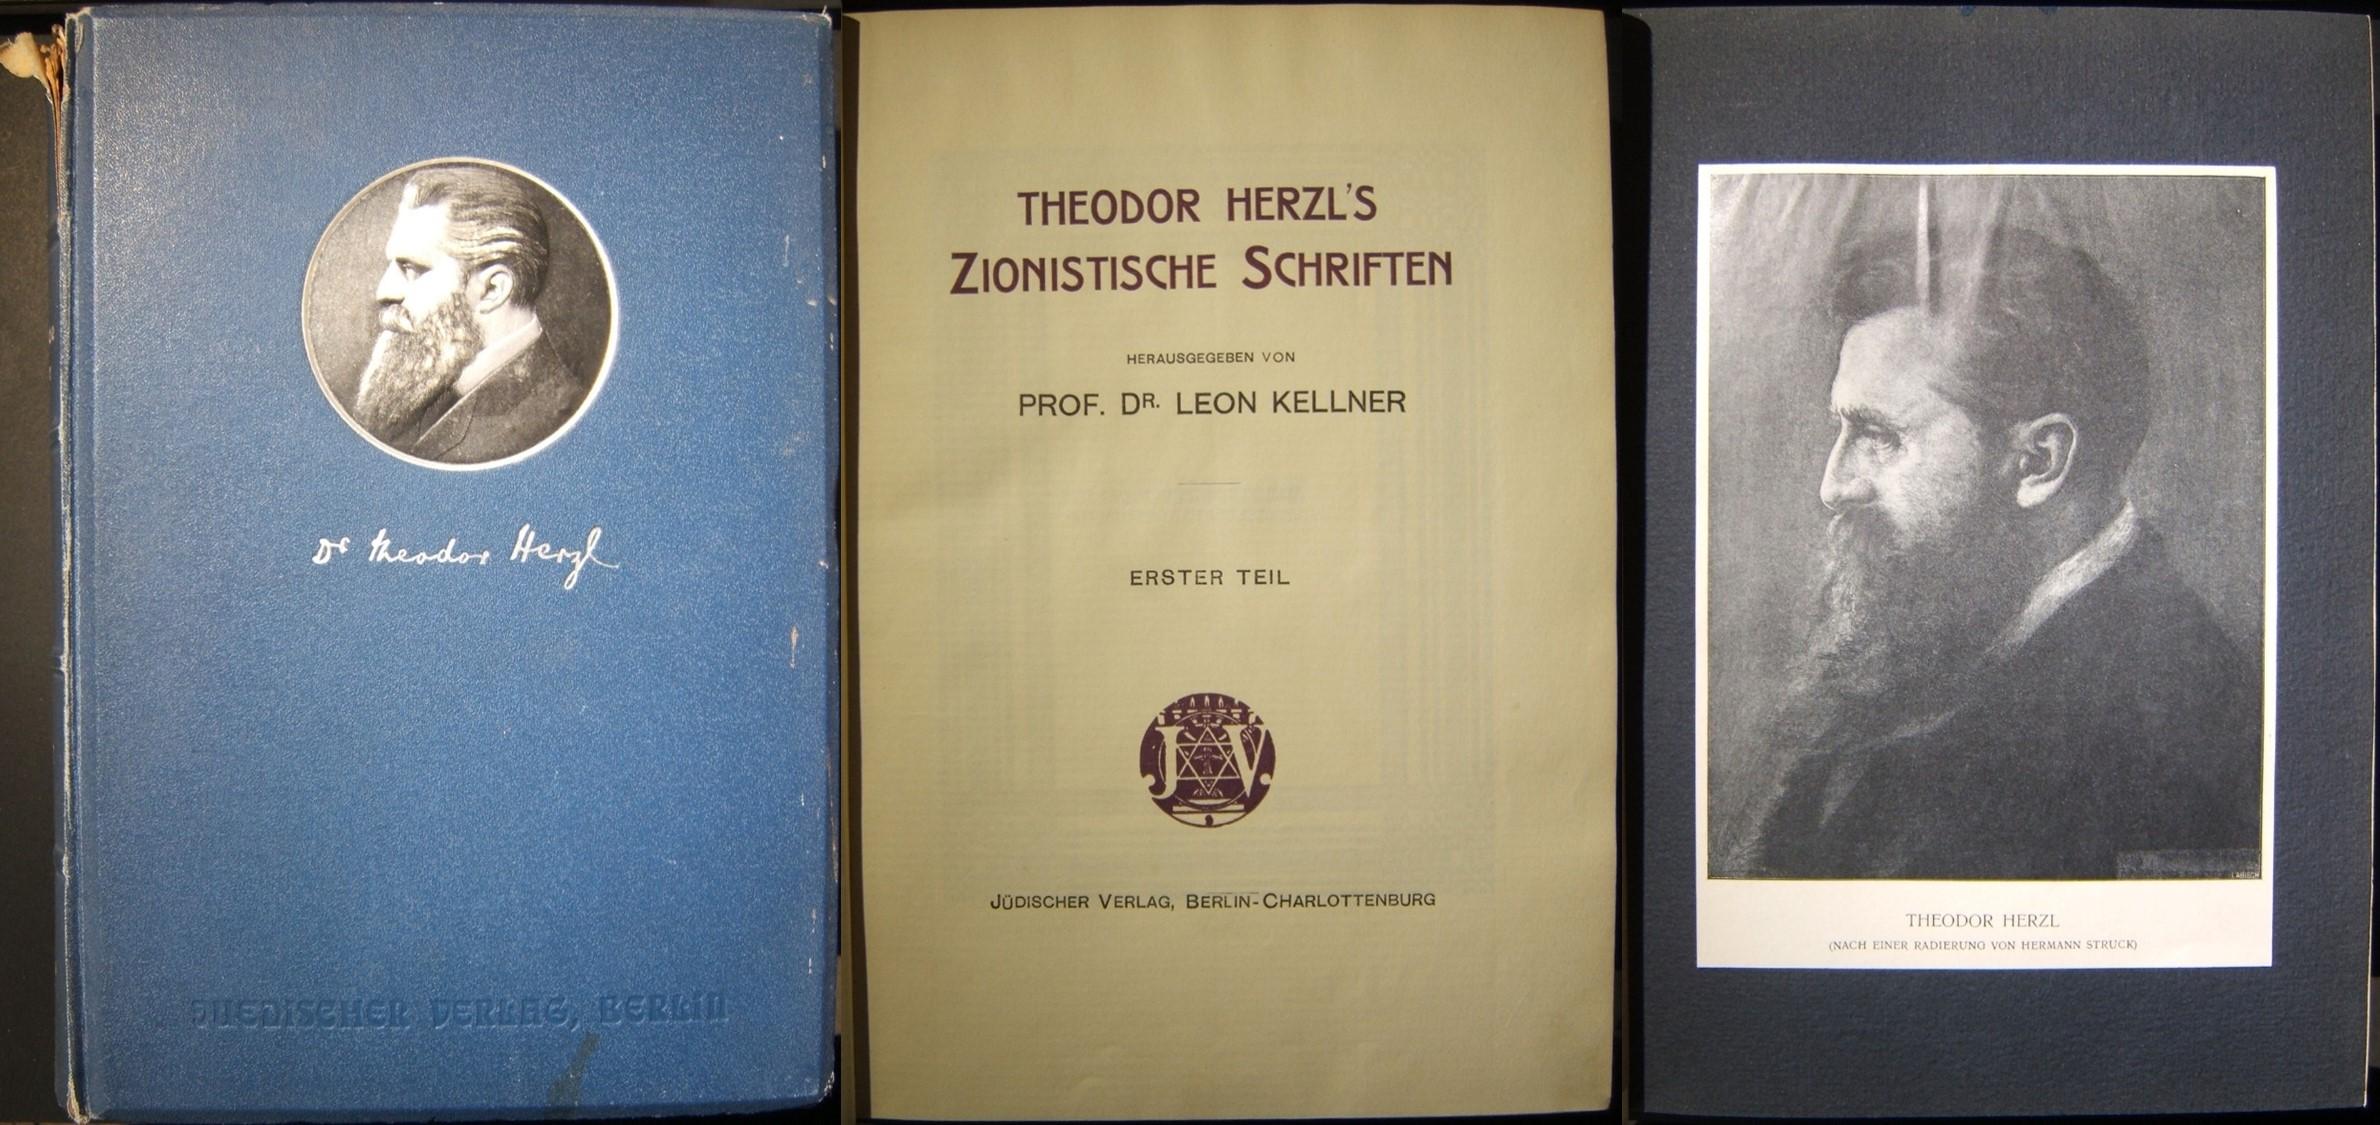 Theodor Herzl's Zionistische Schriften (Zionist Writings), 2 parts in 1 volume, published by Dr. Leon Kellner through Judischer Verlag (1908); 312+312pps +additional pages; incl. p